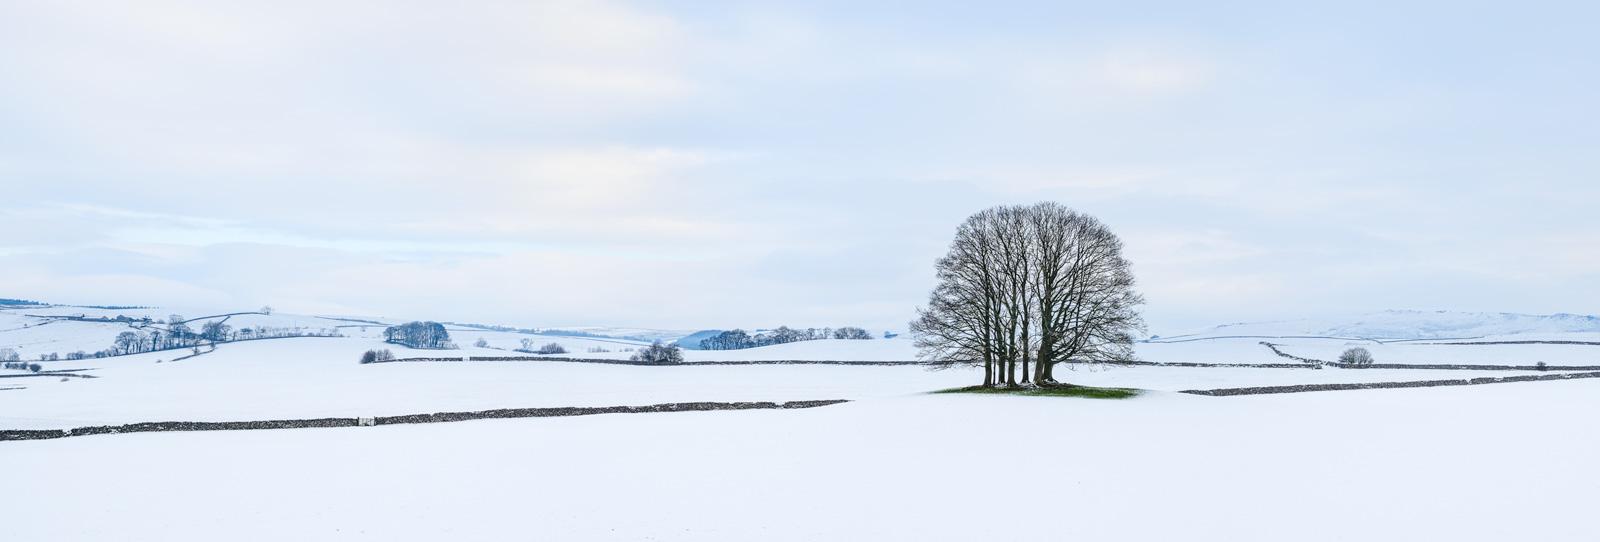 Eshton copse, Yorkshire Dales.Nikon D800e, Zeiss 35mm f2, ISO 100, 1/80s at f/9, tripod. Stitched pano. January.© Lizzie Shepherd